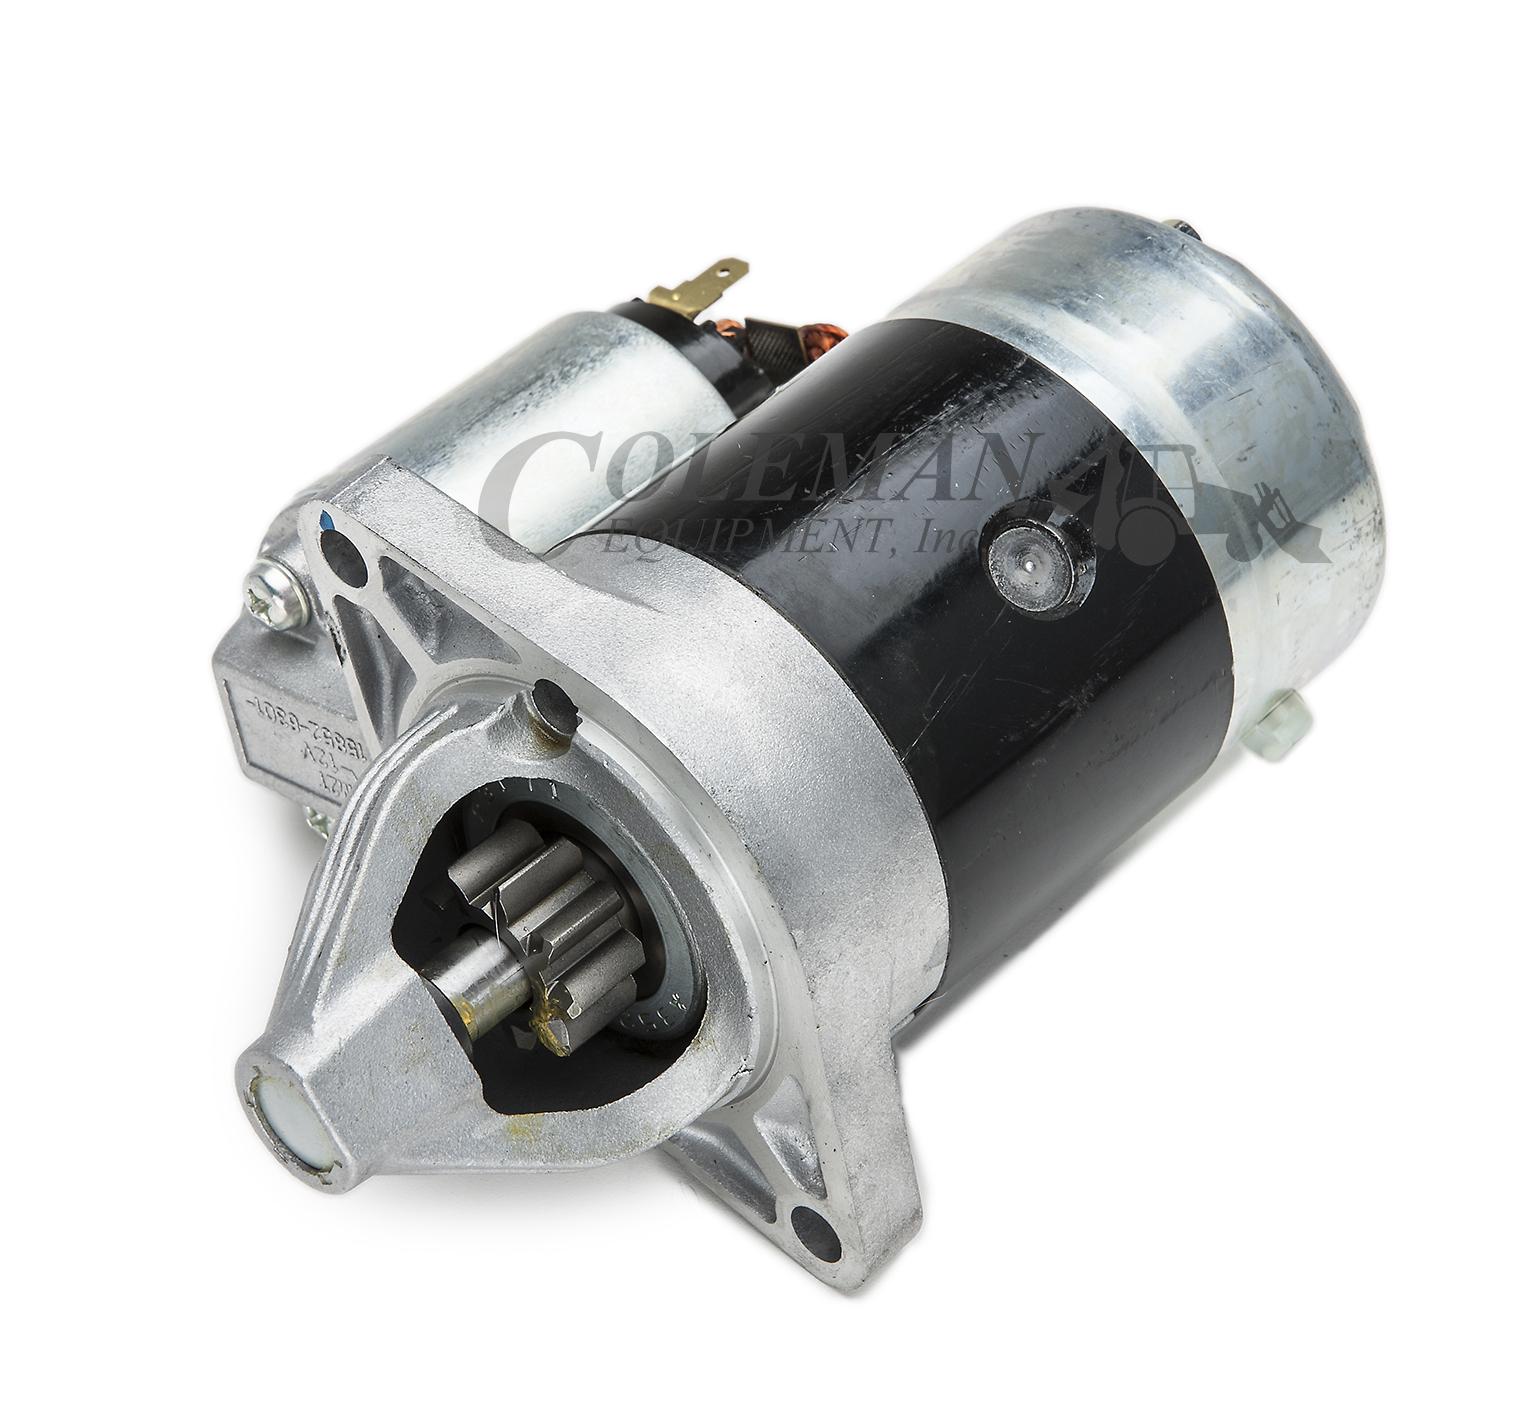 hight resolution of  kubota kubota remanufactured starter 15852 63014 kears 15852 coleman on how to kubota g h ignition switch wiring diagram